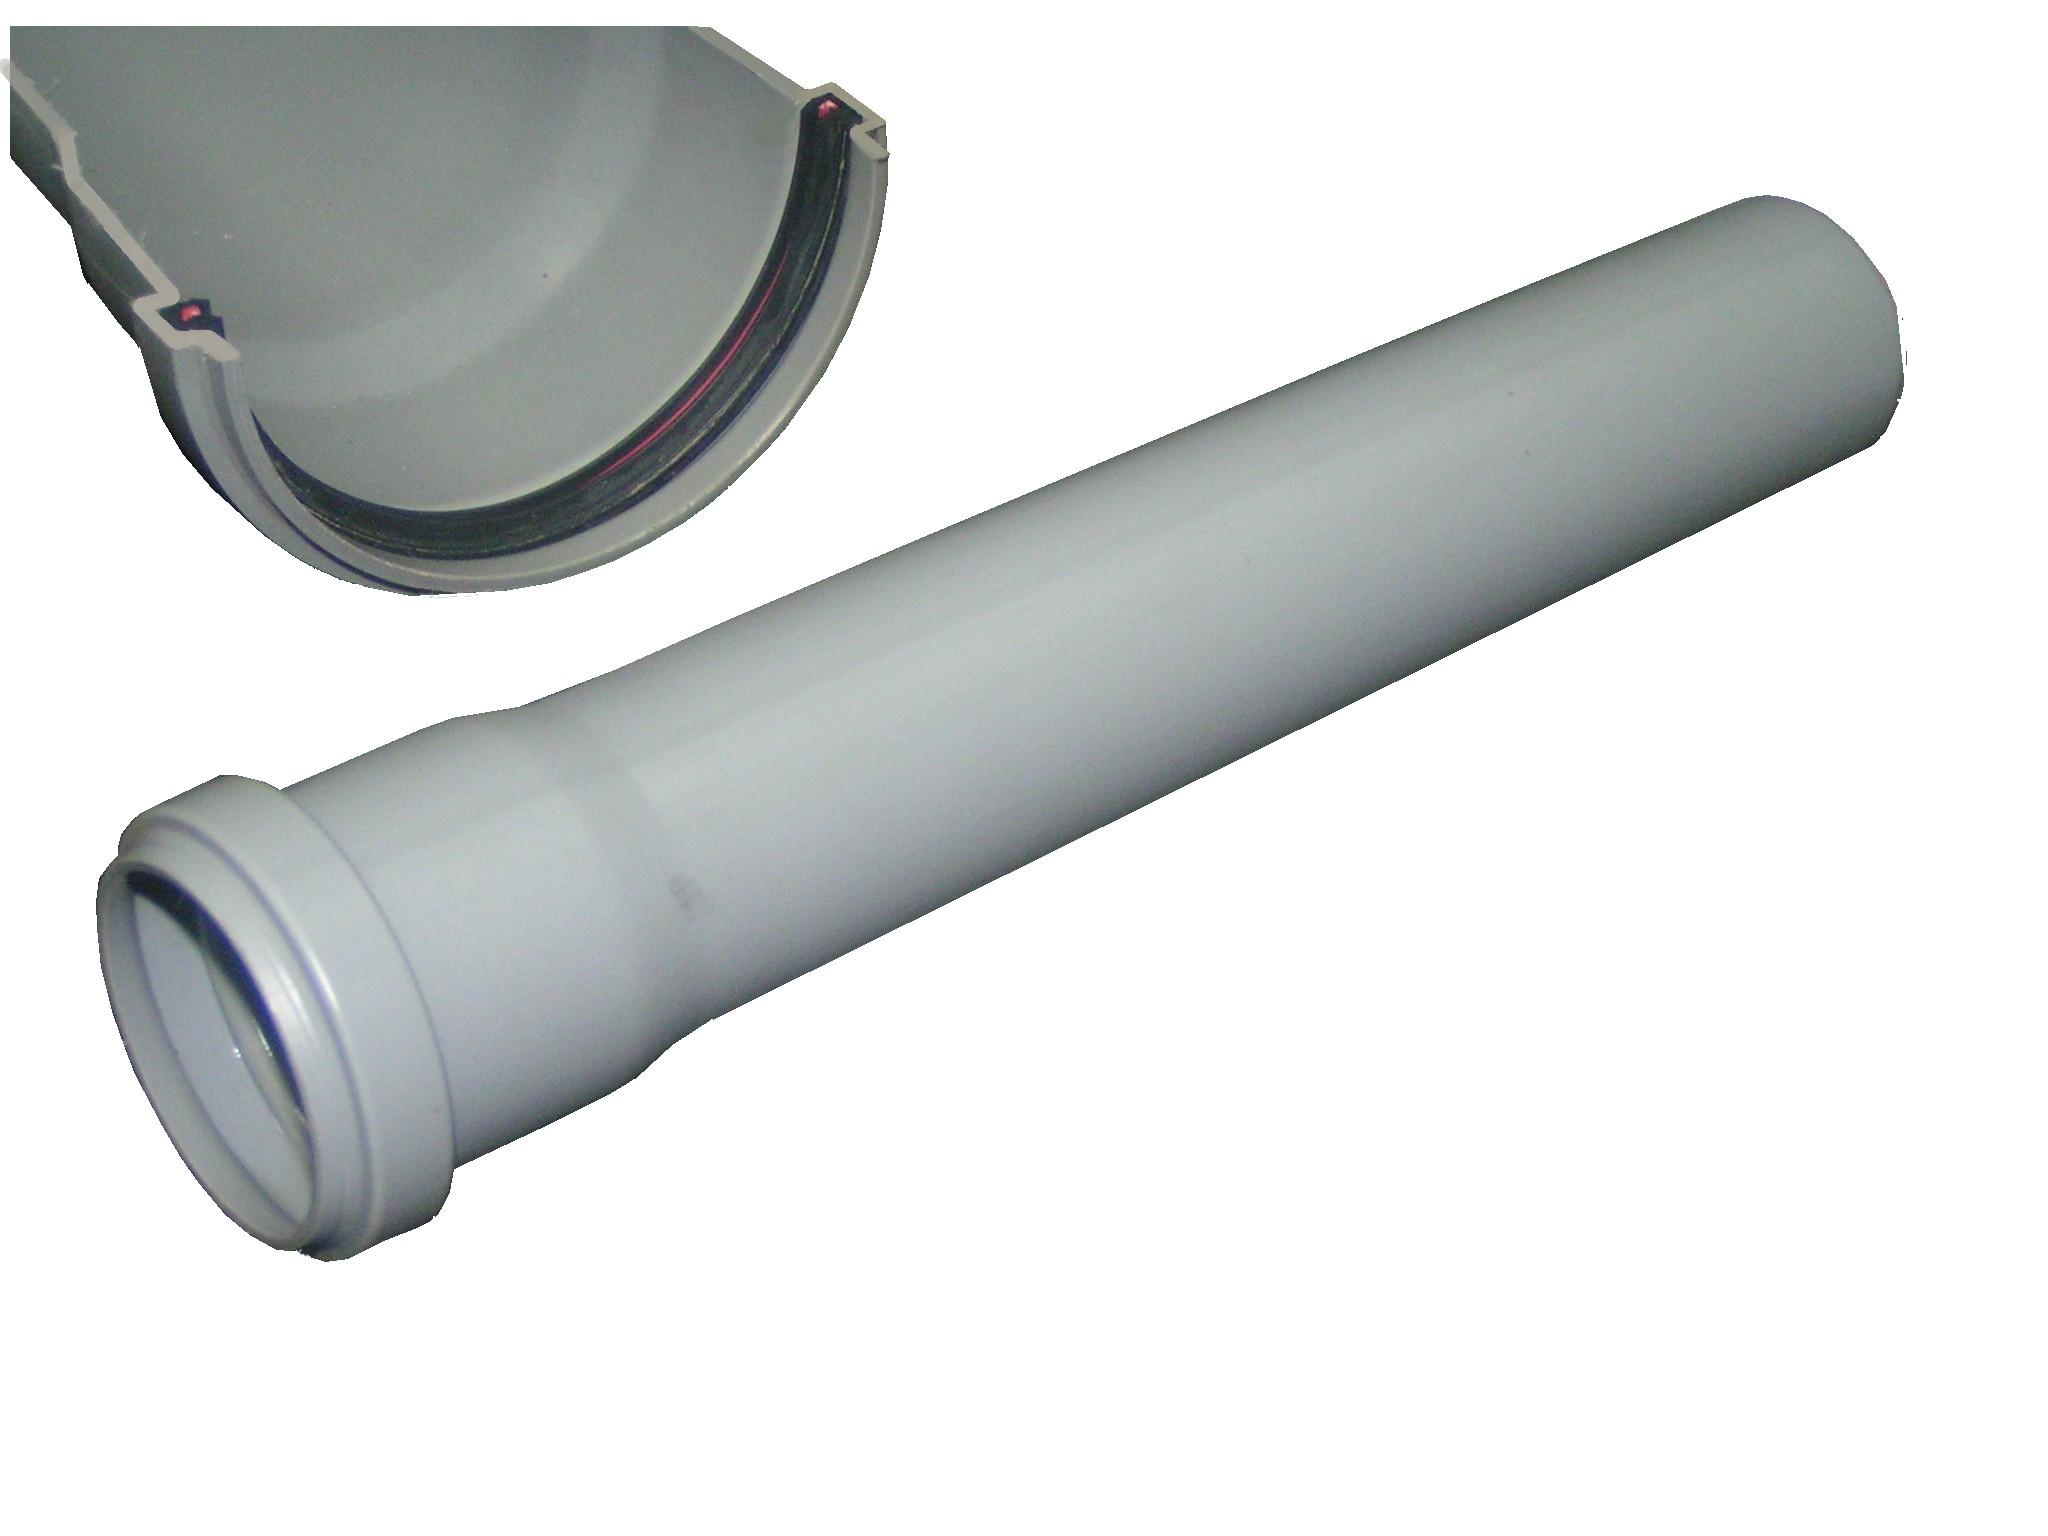 Труба PP ф110мм L 3000 COMFORT шумопогл.(1/15)